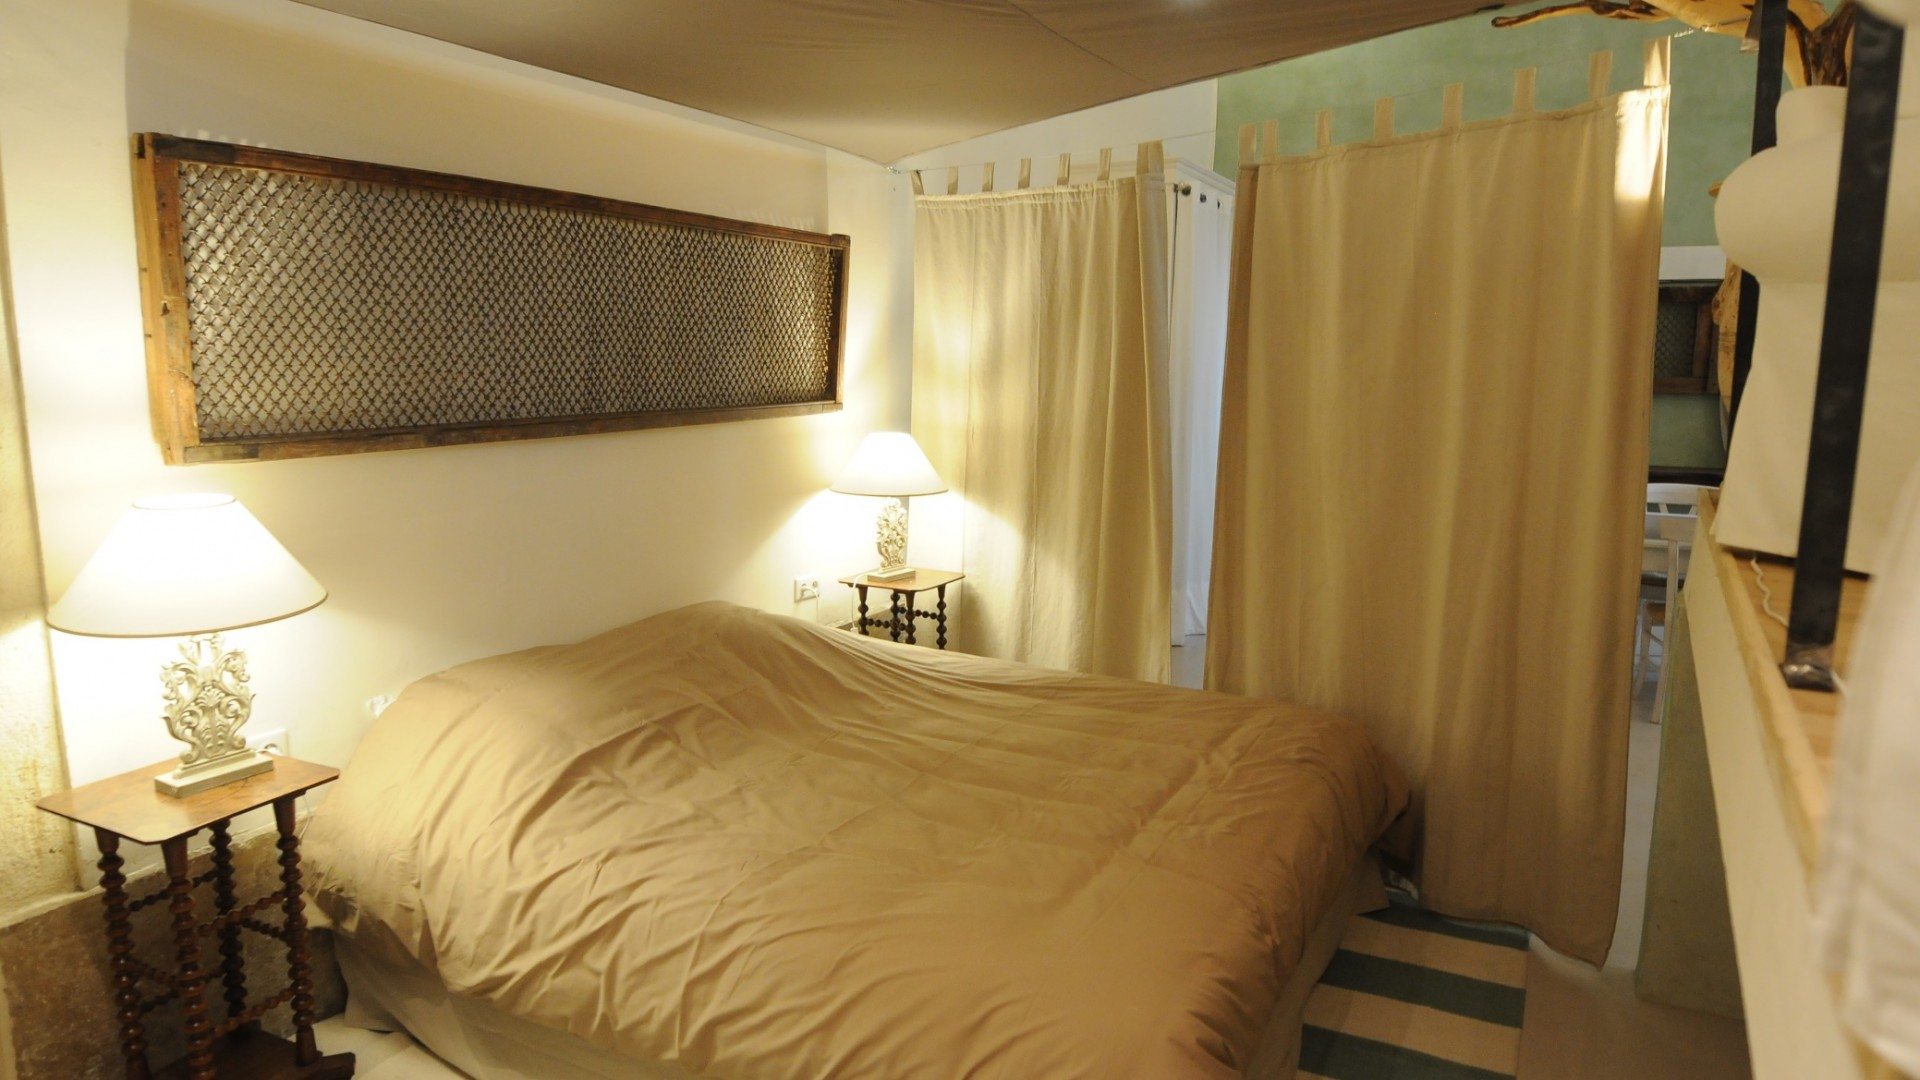 Bedroom corner with a kingsize bed